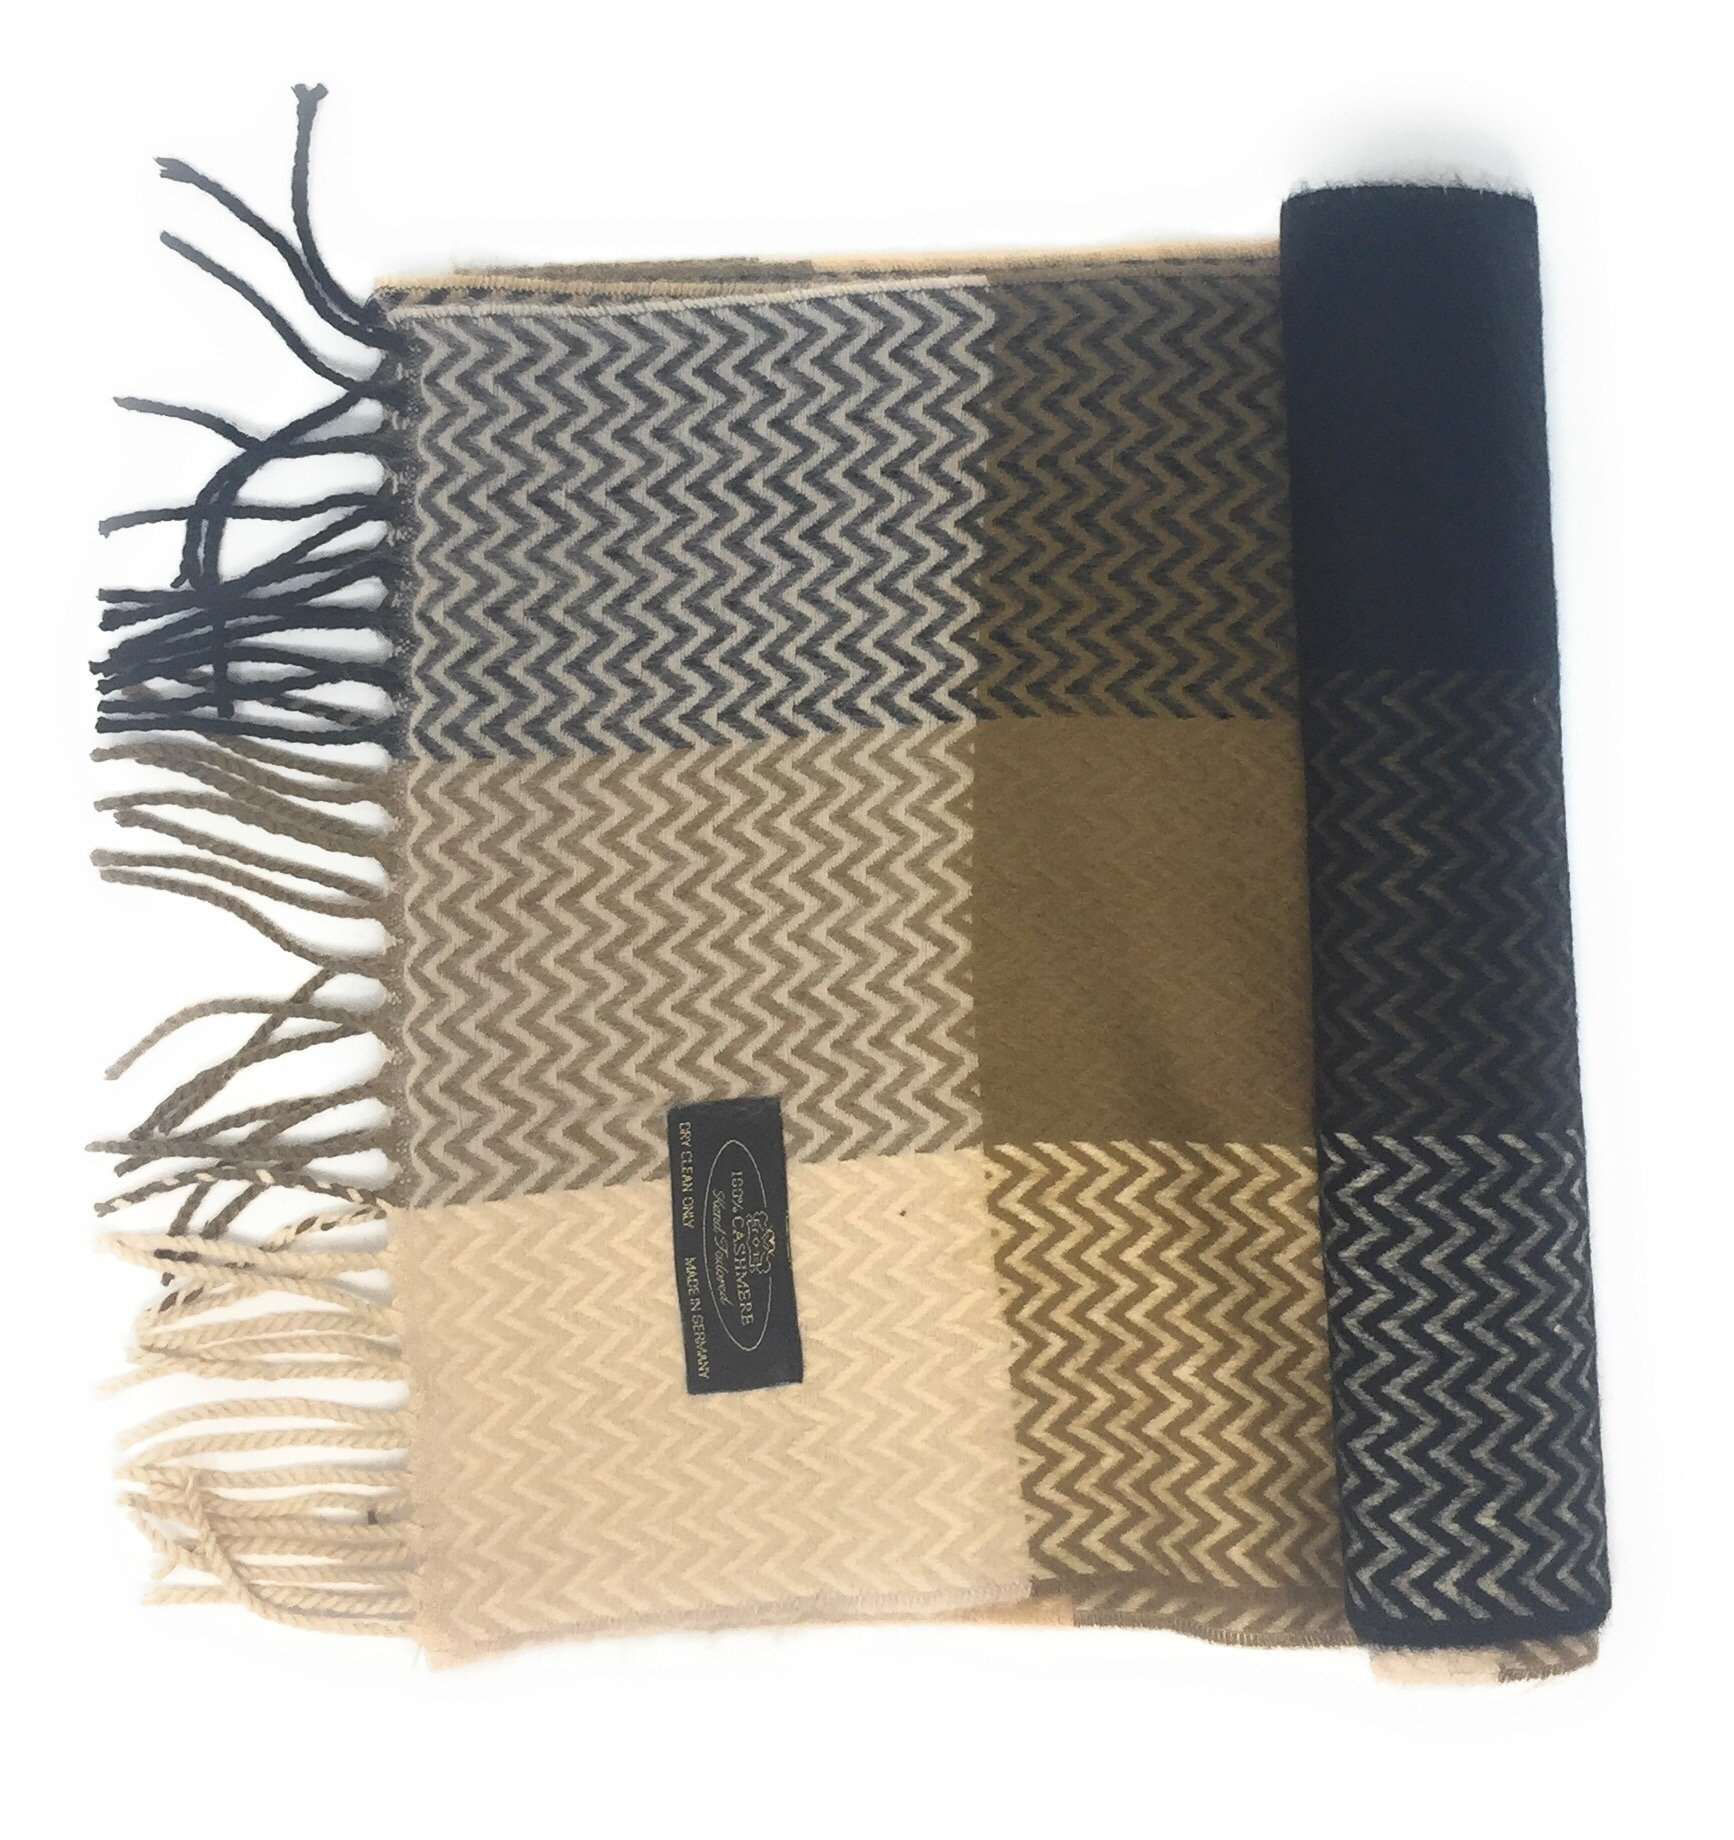 Annys 100% Cashmere Plaid Scarf 12x72 with Gift Bag - Men Cashmere - Cashmere Women (22 Colors) (Chevron - Brown/Tan/Black)